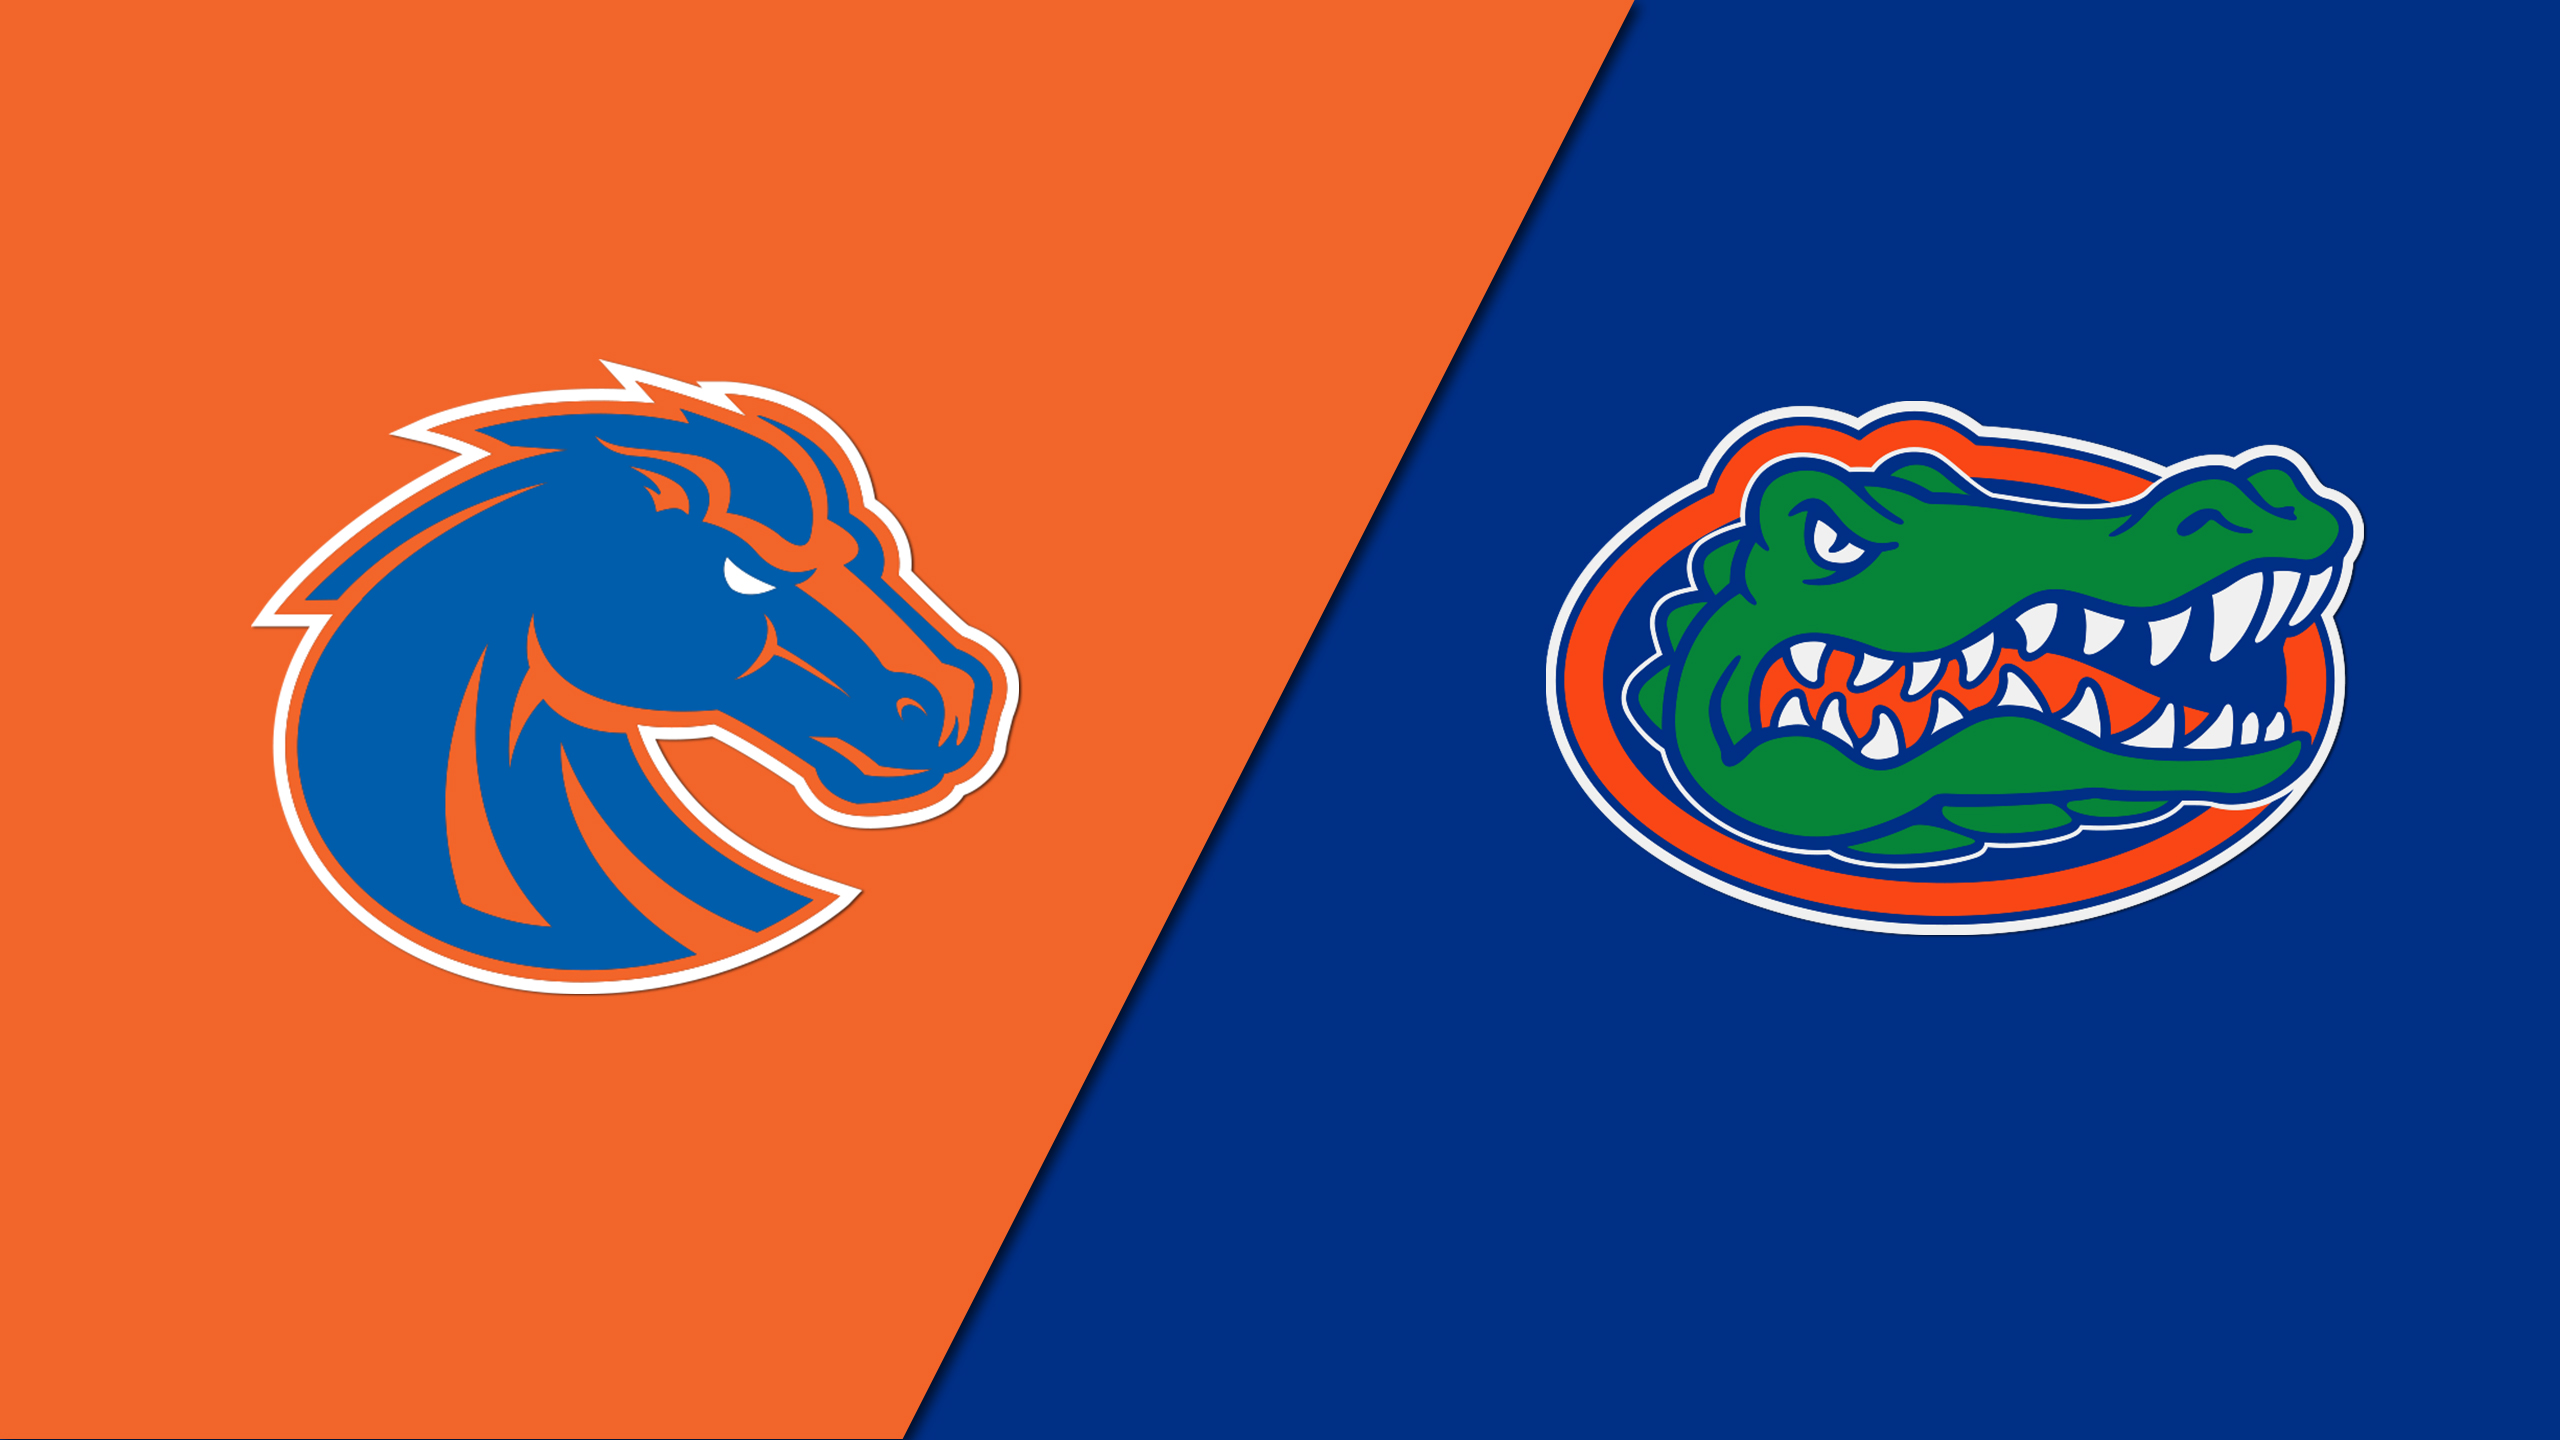 Boise State vs. Florida (Site 3 / Game 6)